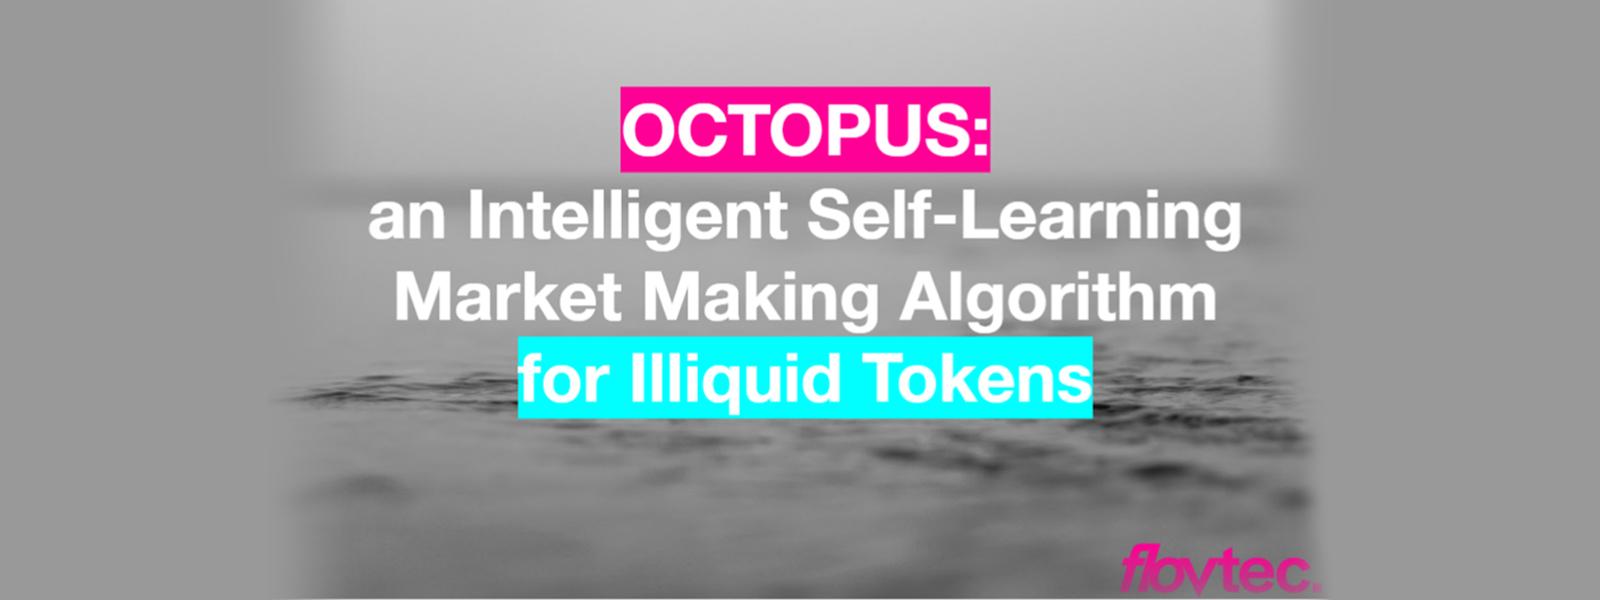 Octopus: an Intelligent Self-Learning Market Making Algorithm for Illiquid Tokens